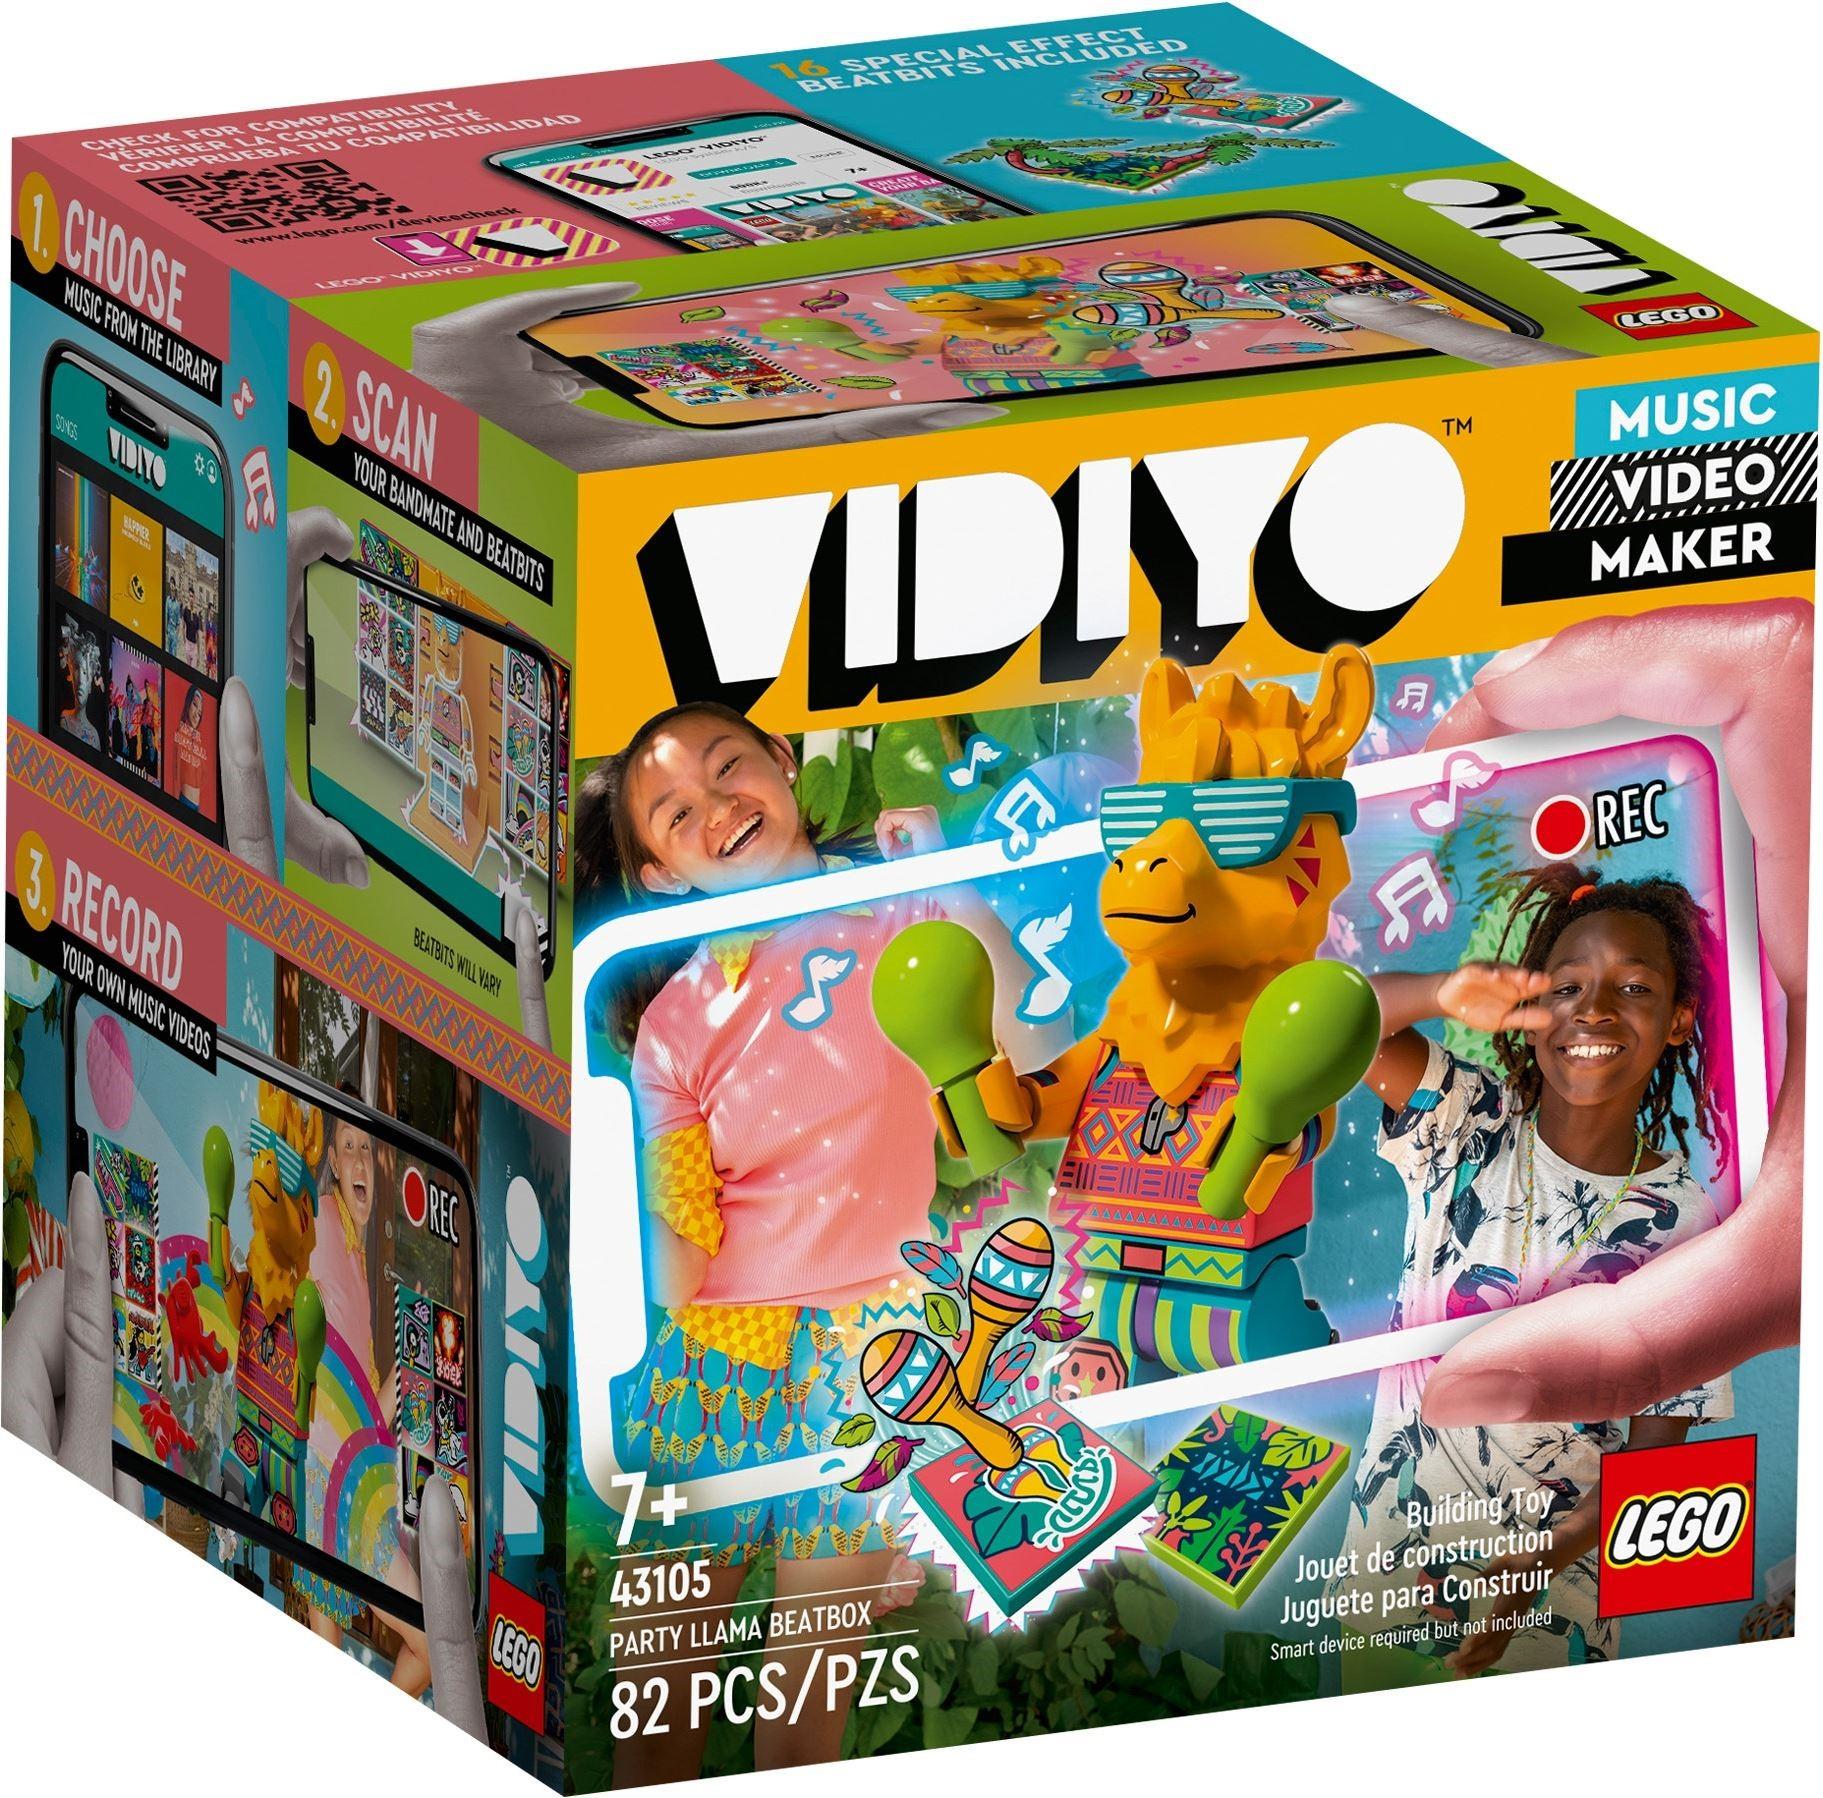 LEGO VIDIYO - Party Llama BeatBox (43105)